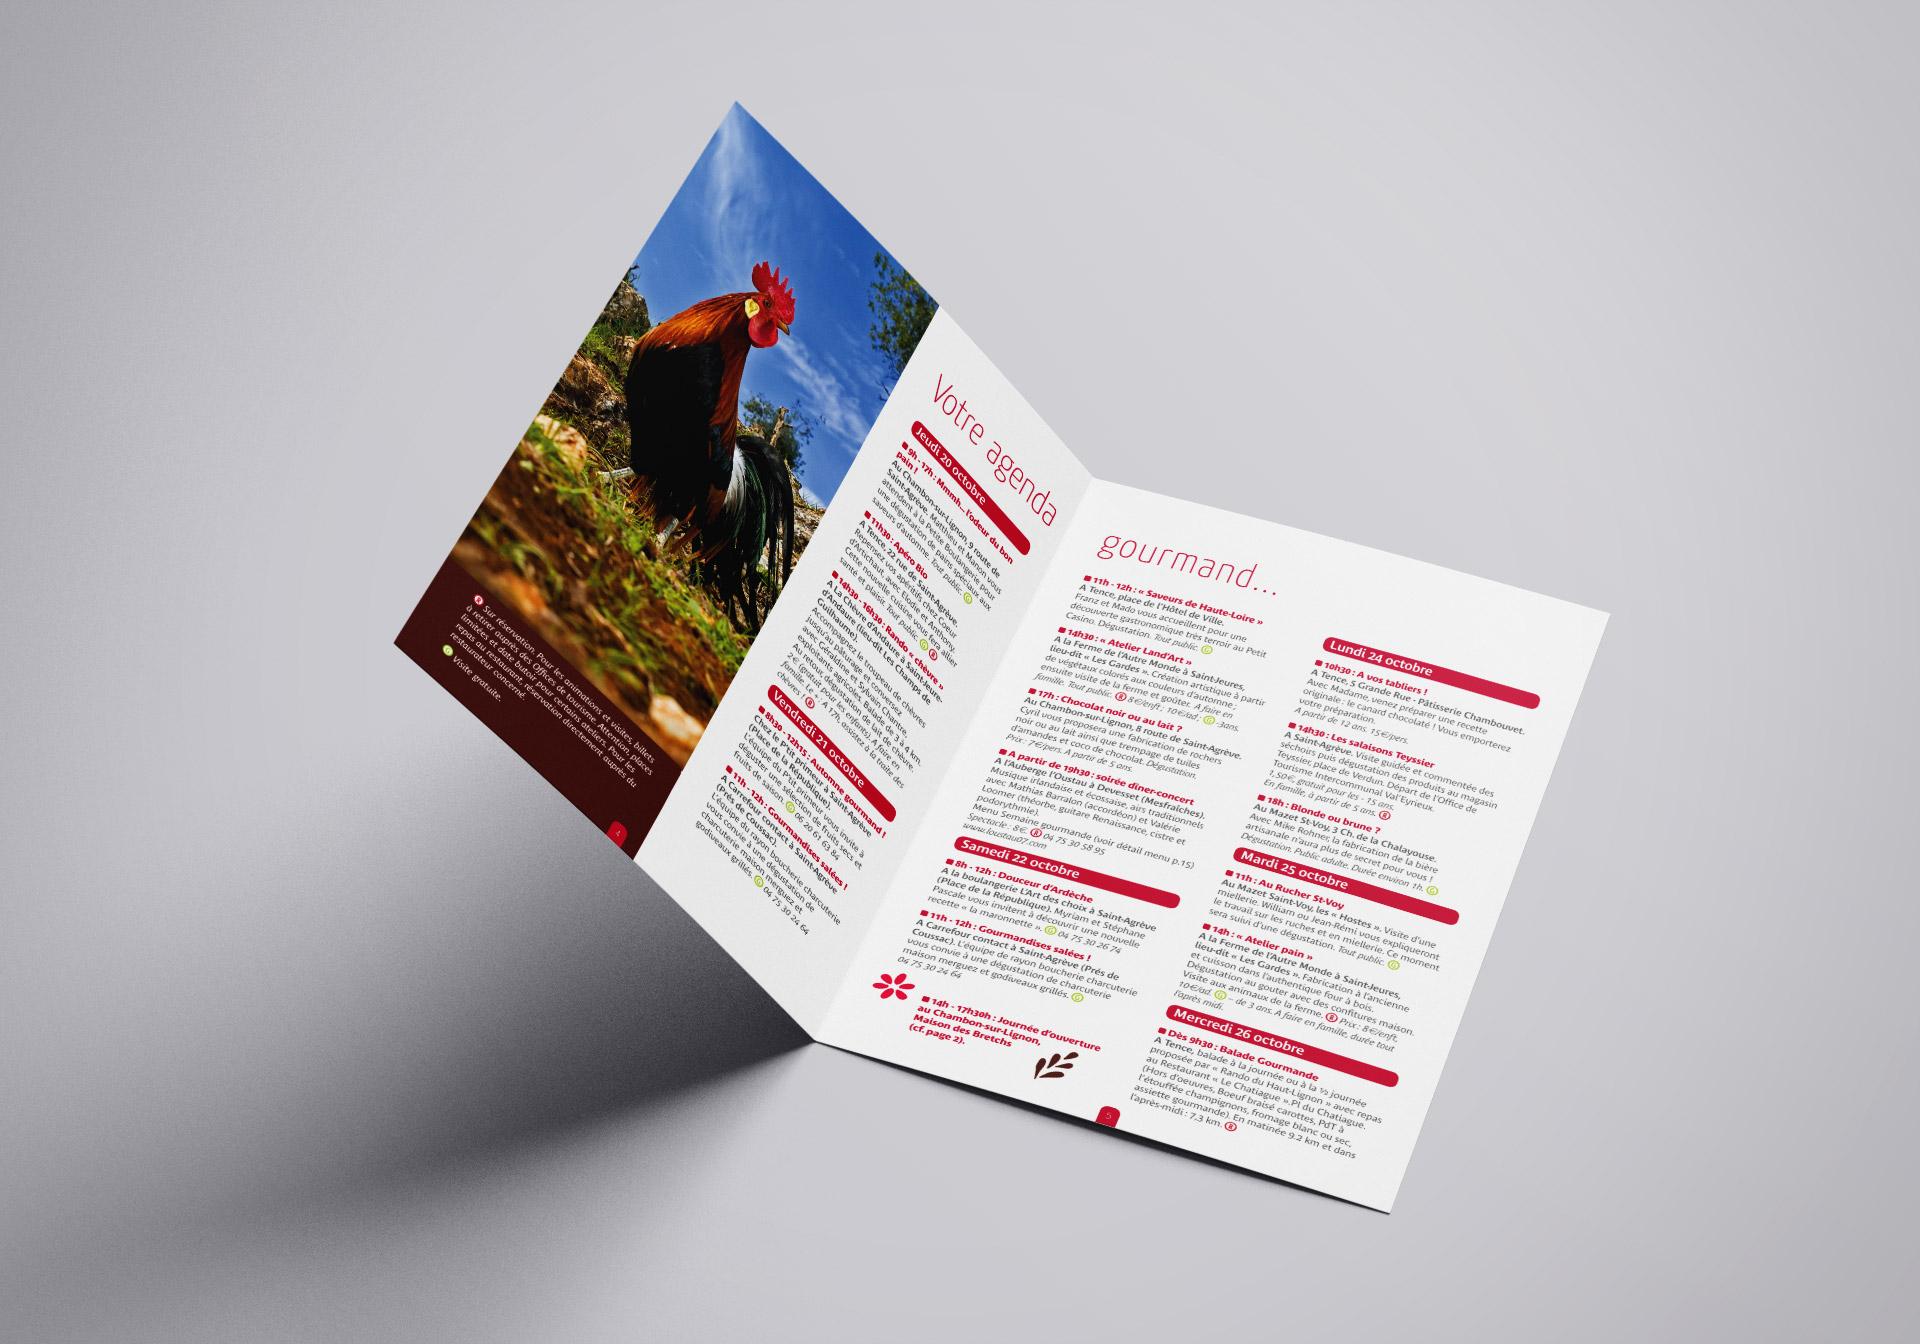 L'agence studio N3 crée la brochure de la semaine gourmande